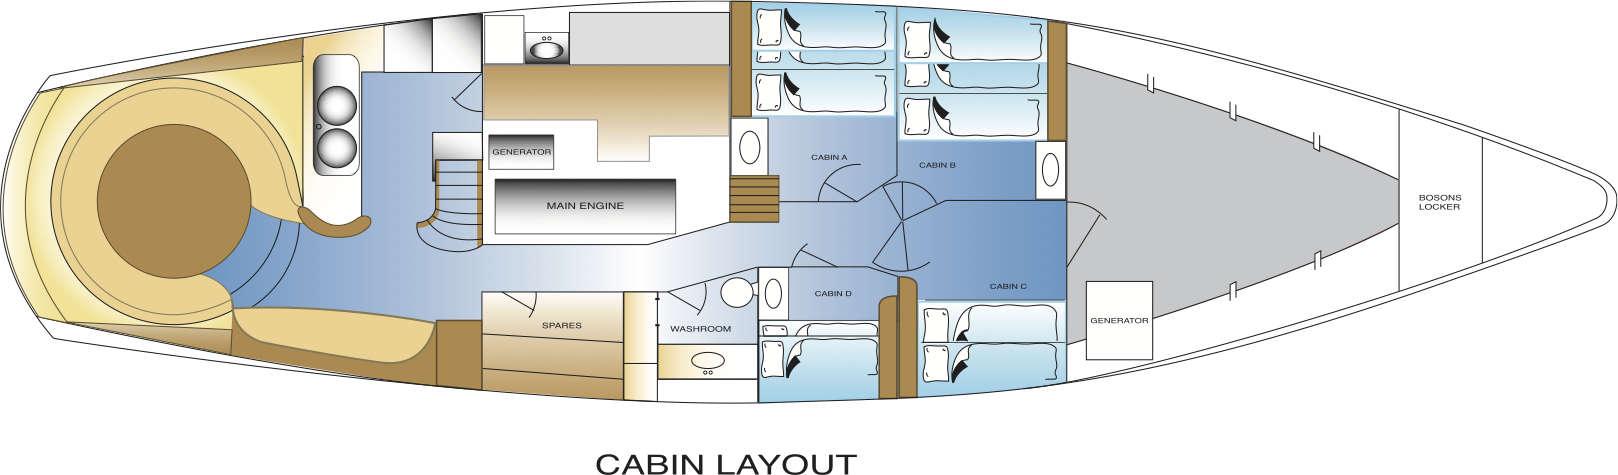 [Imagen: cab_layout-2.jpg]